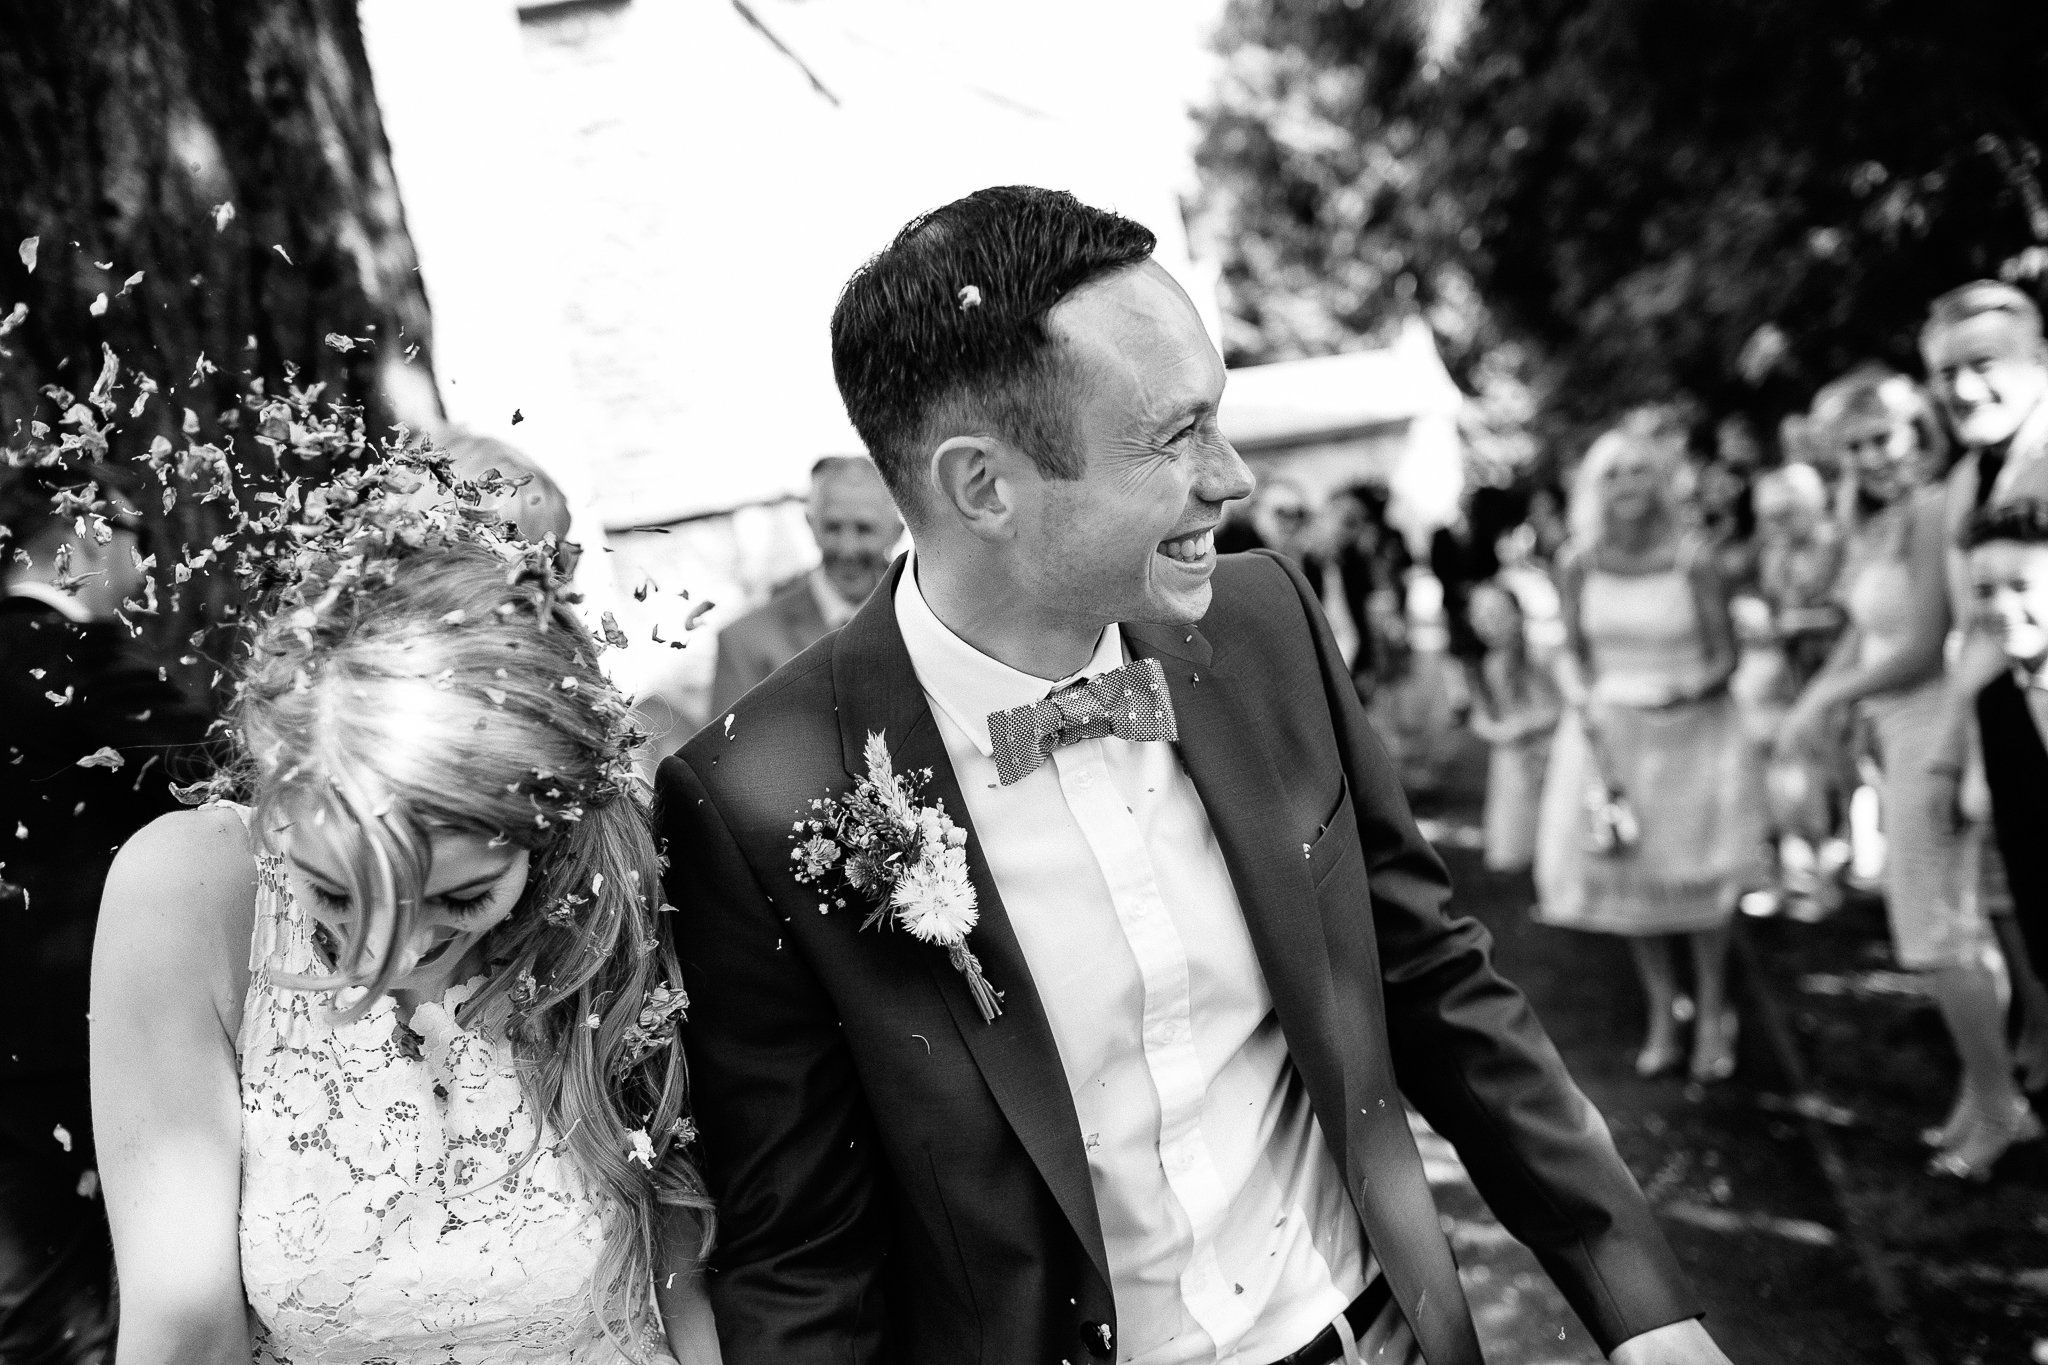 grantham_wedding_photographer-70.jpg